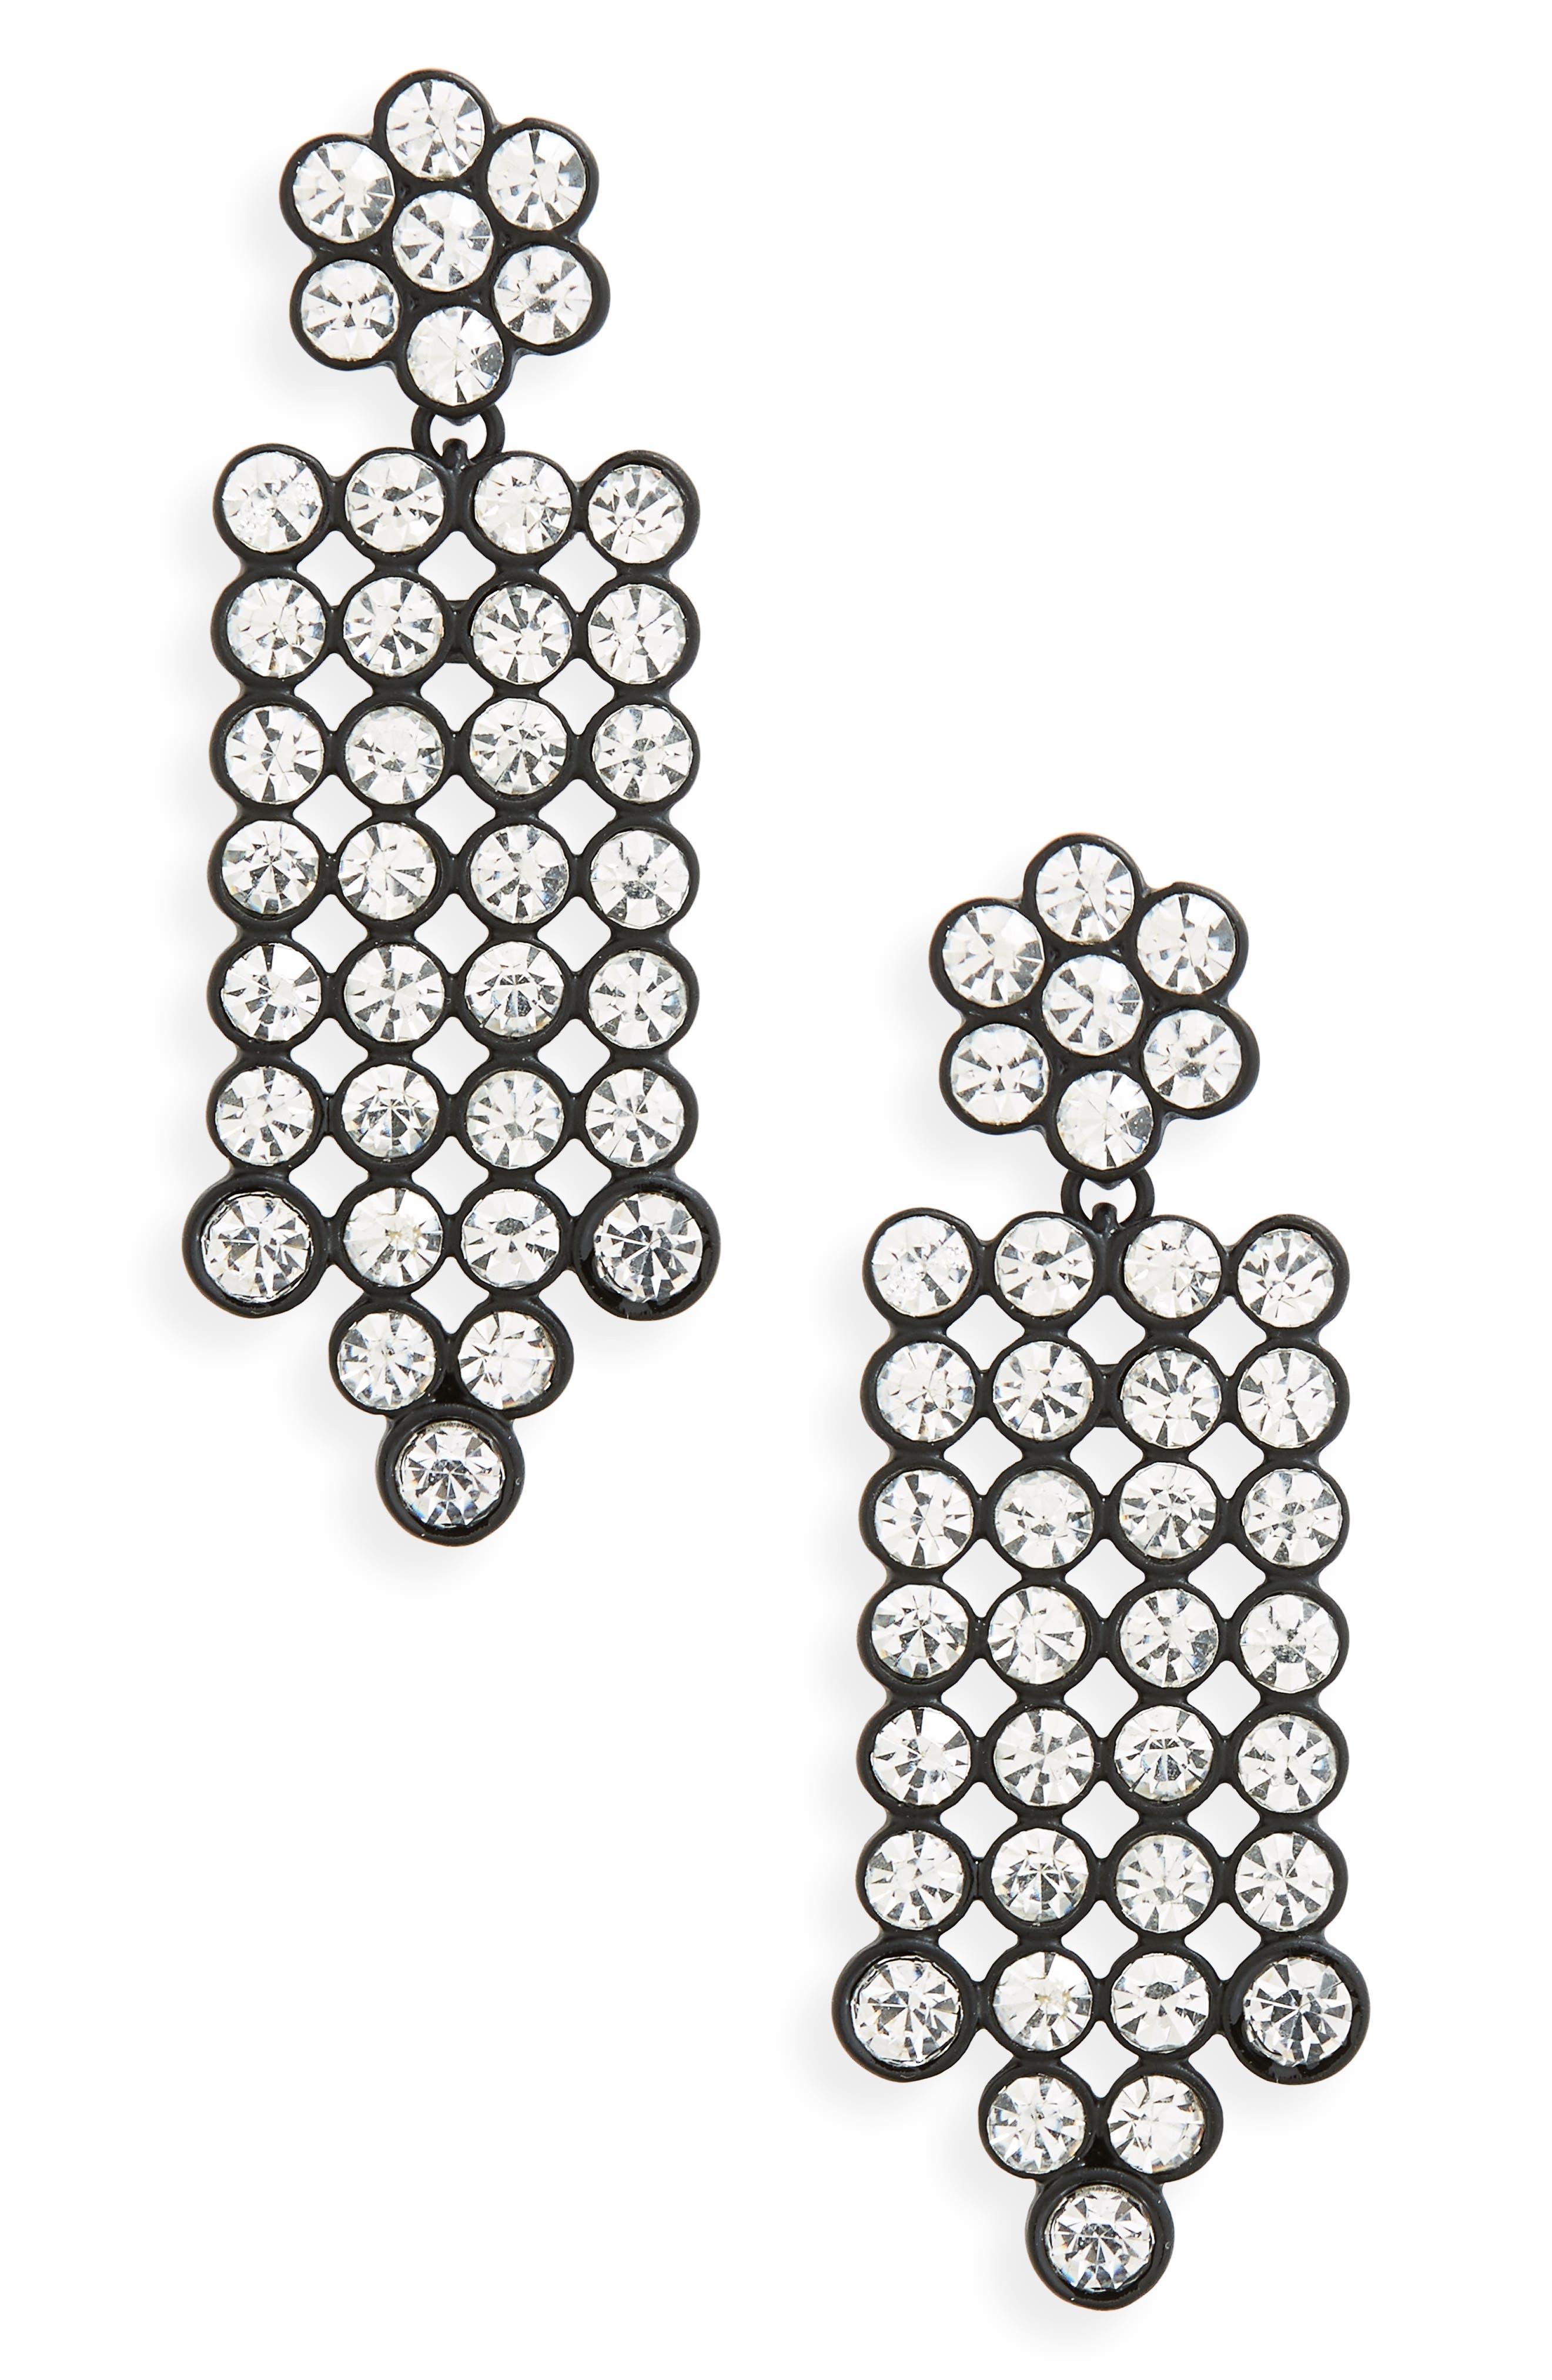 Disco Drop Earrings,                             Main thumbnail 1, color,                             Hematite